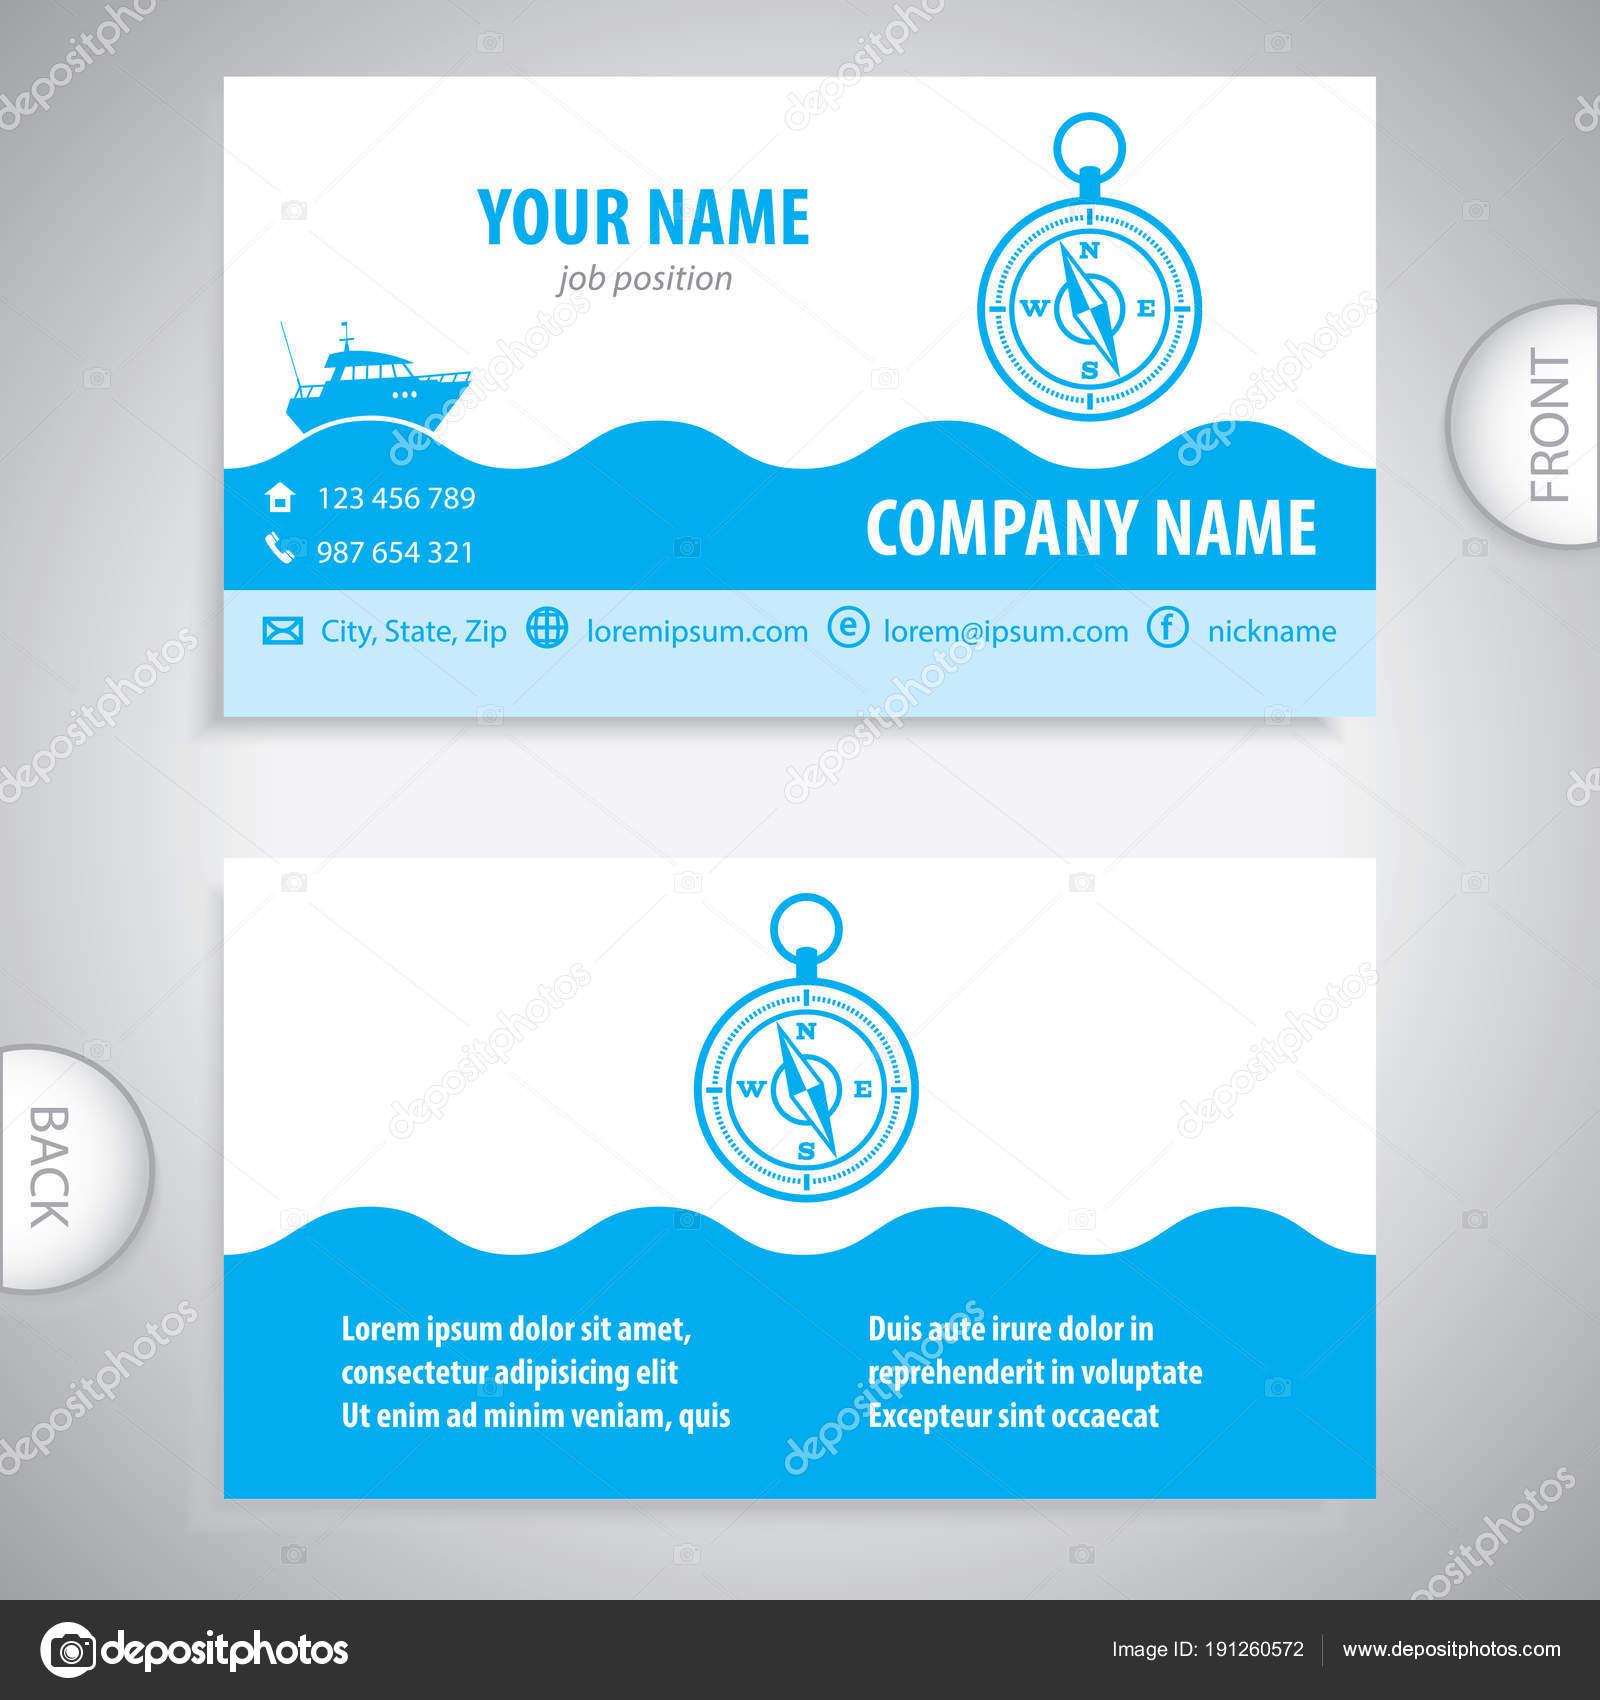 Business card navigation compass maritime symbols stock vector business card navigation compass maritime symbols company presentations vector by trompinex reheart Choice Image